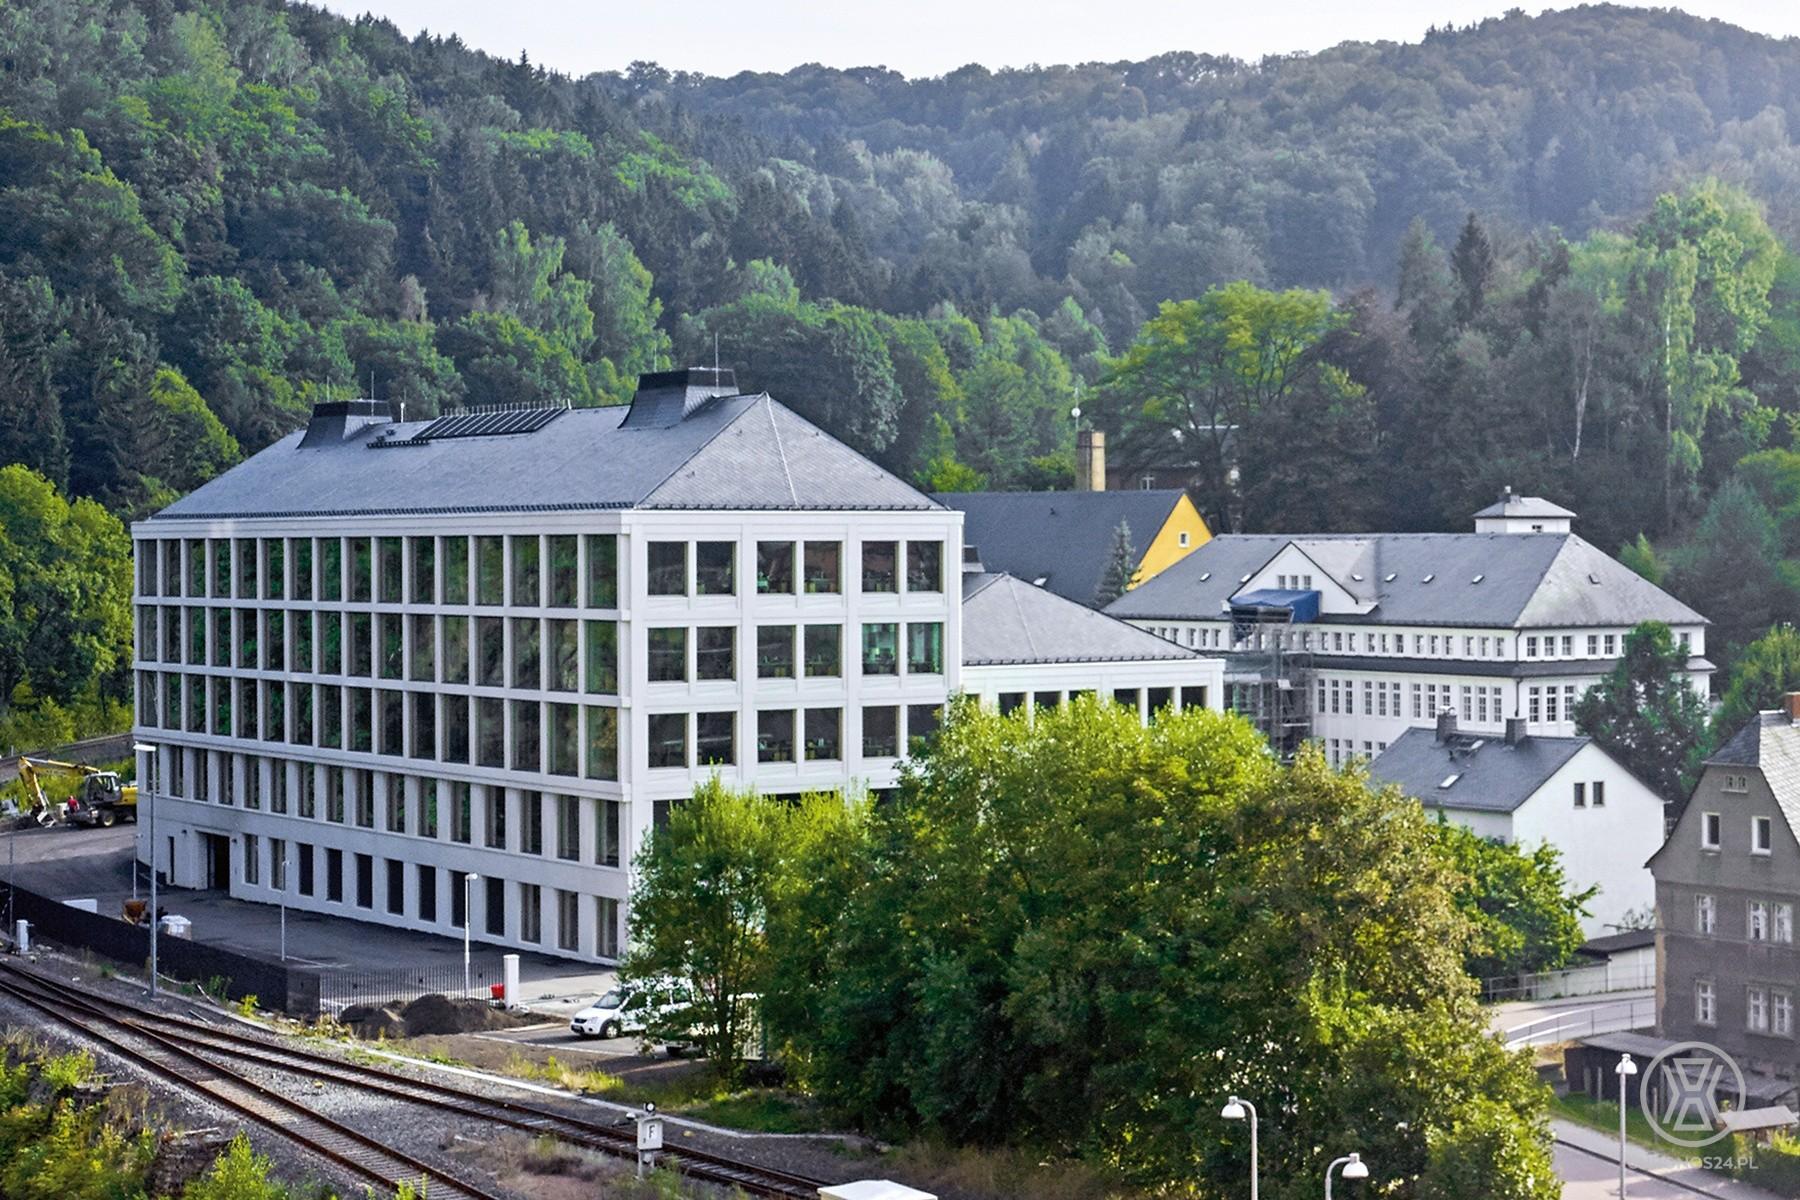 Nowa manufaktura A. Lange & Söhne